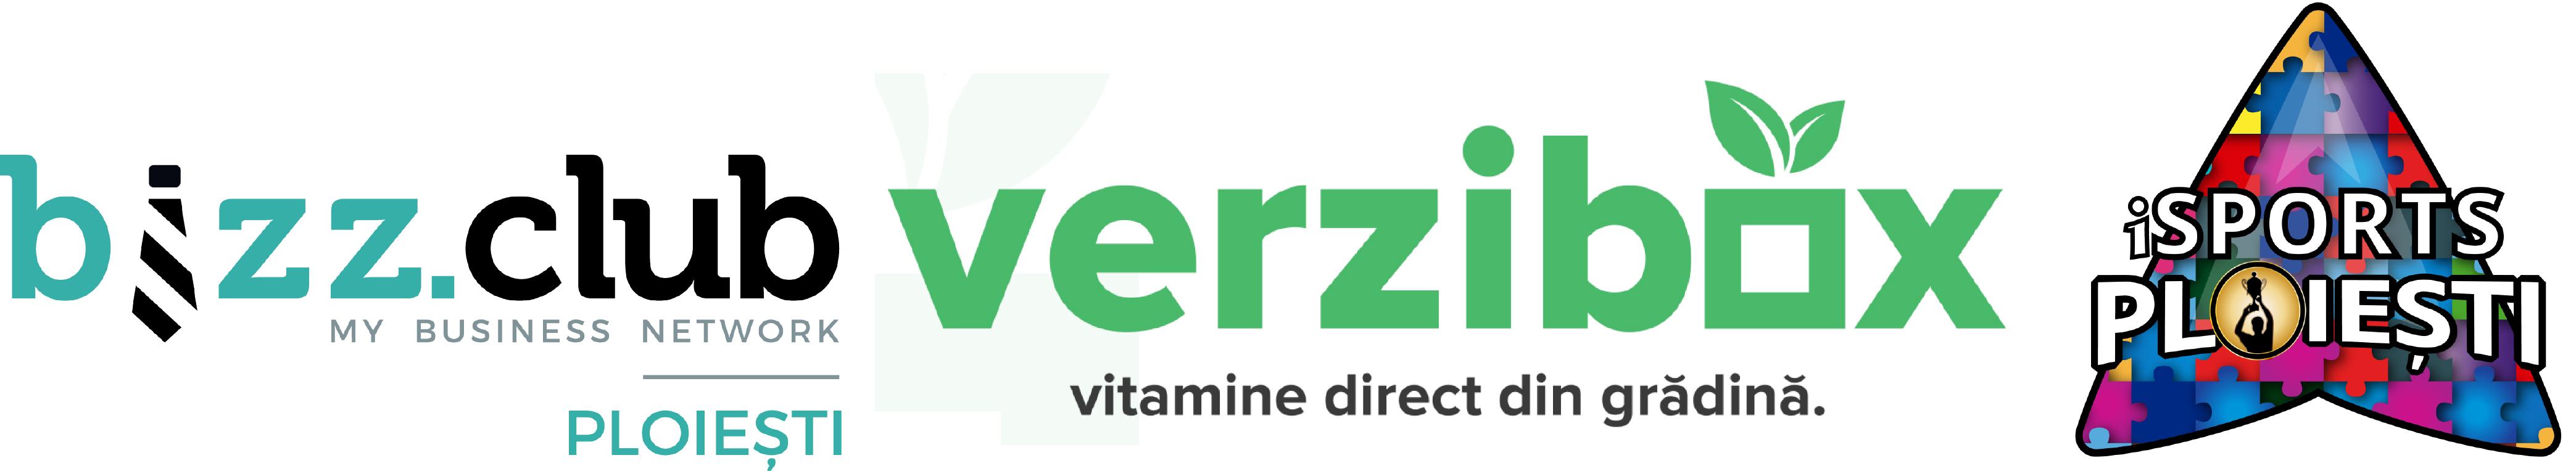 Owner Bizz.club, Partener Verzibox, Președinte Isports